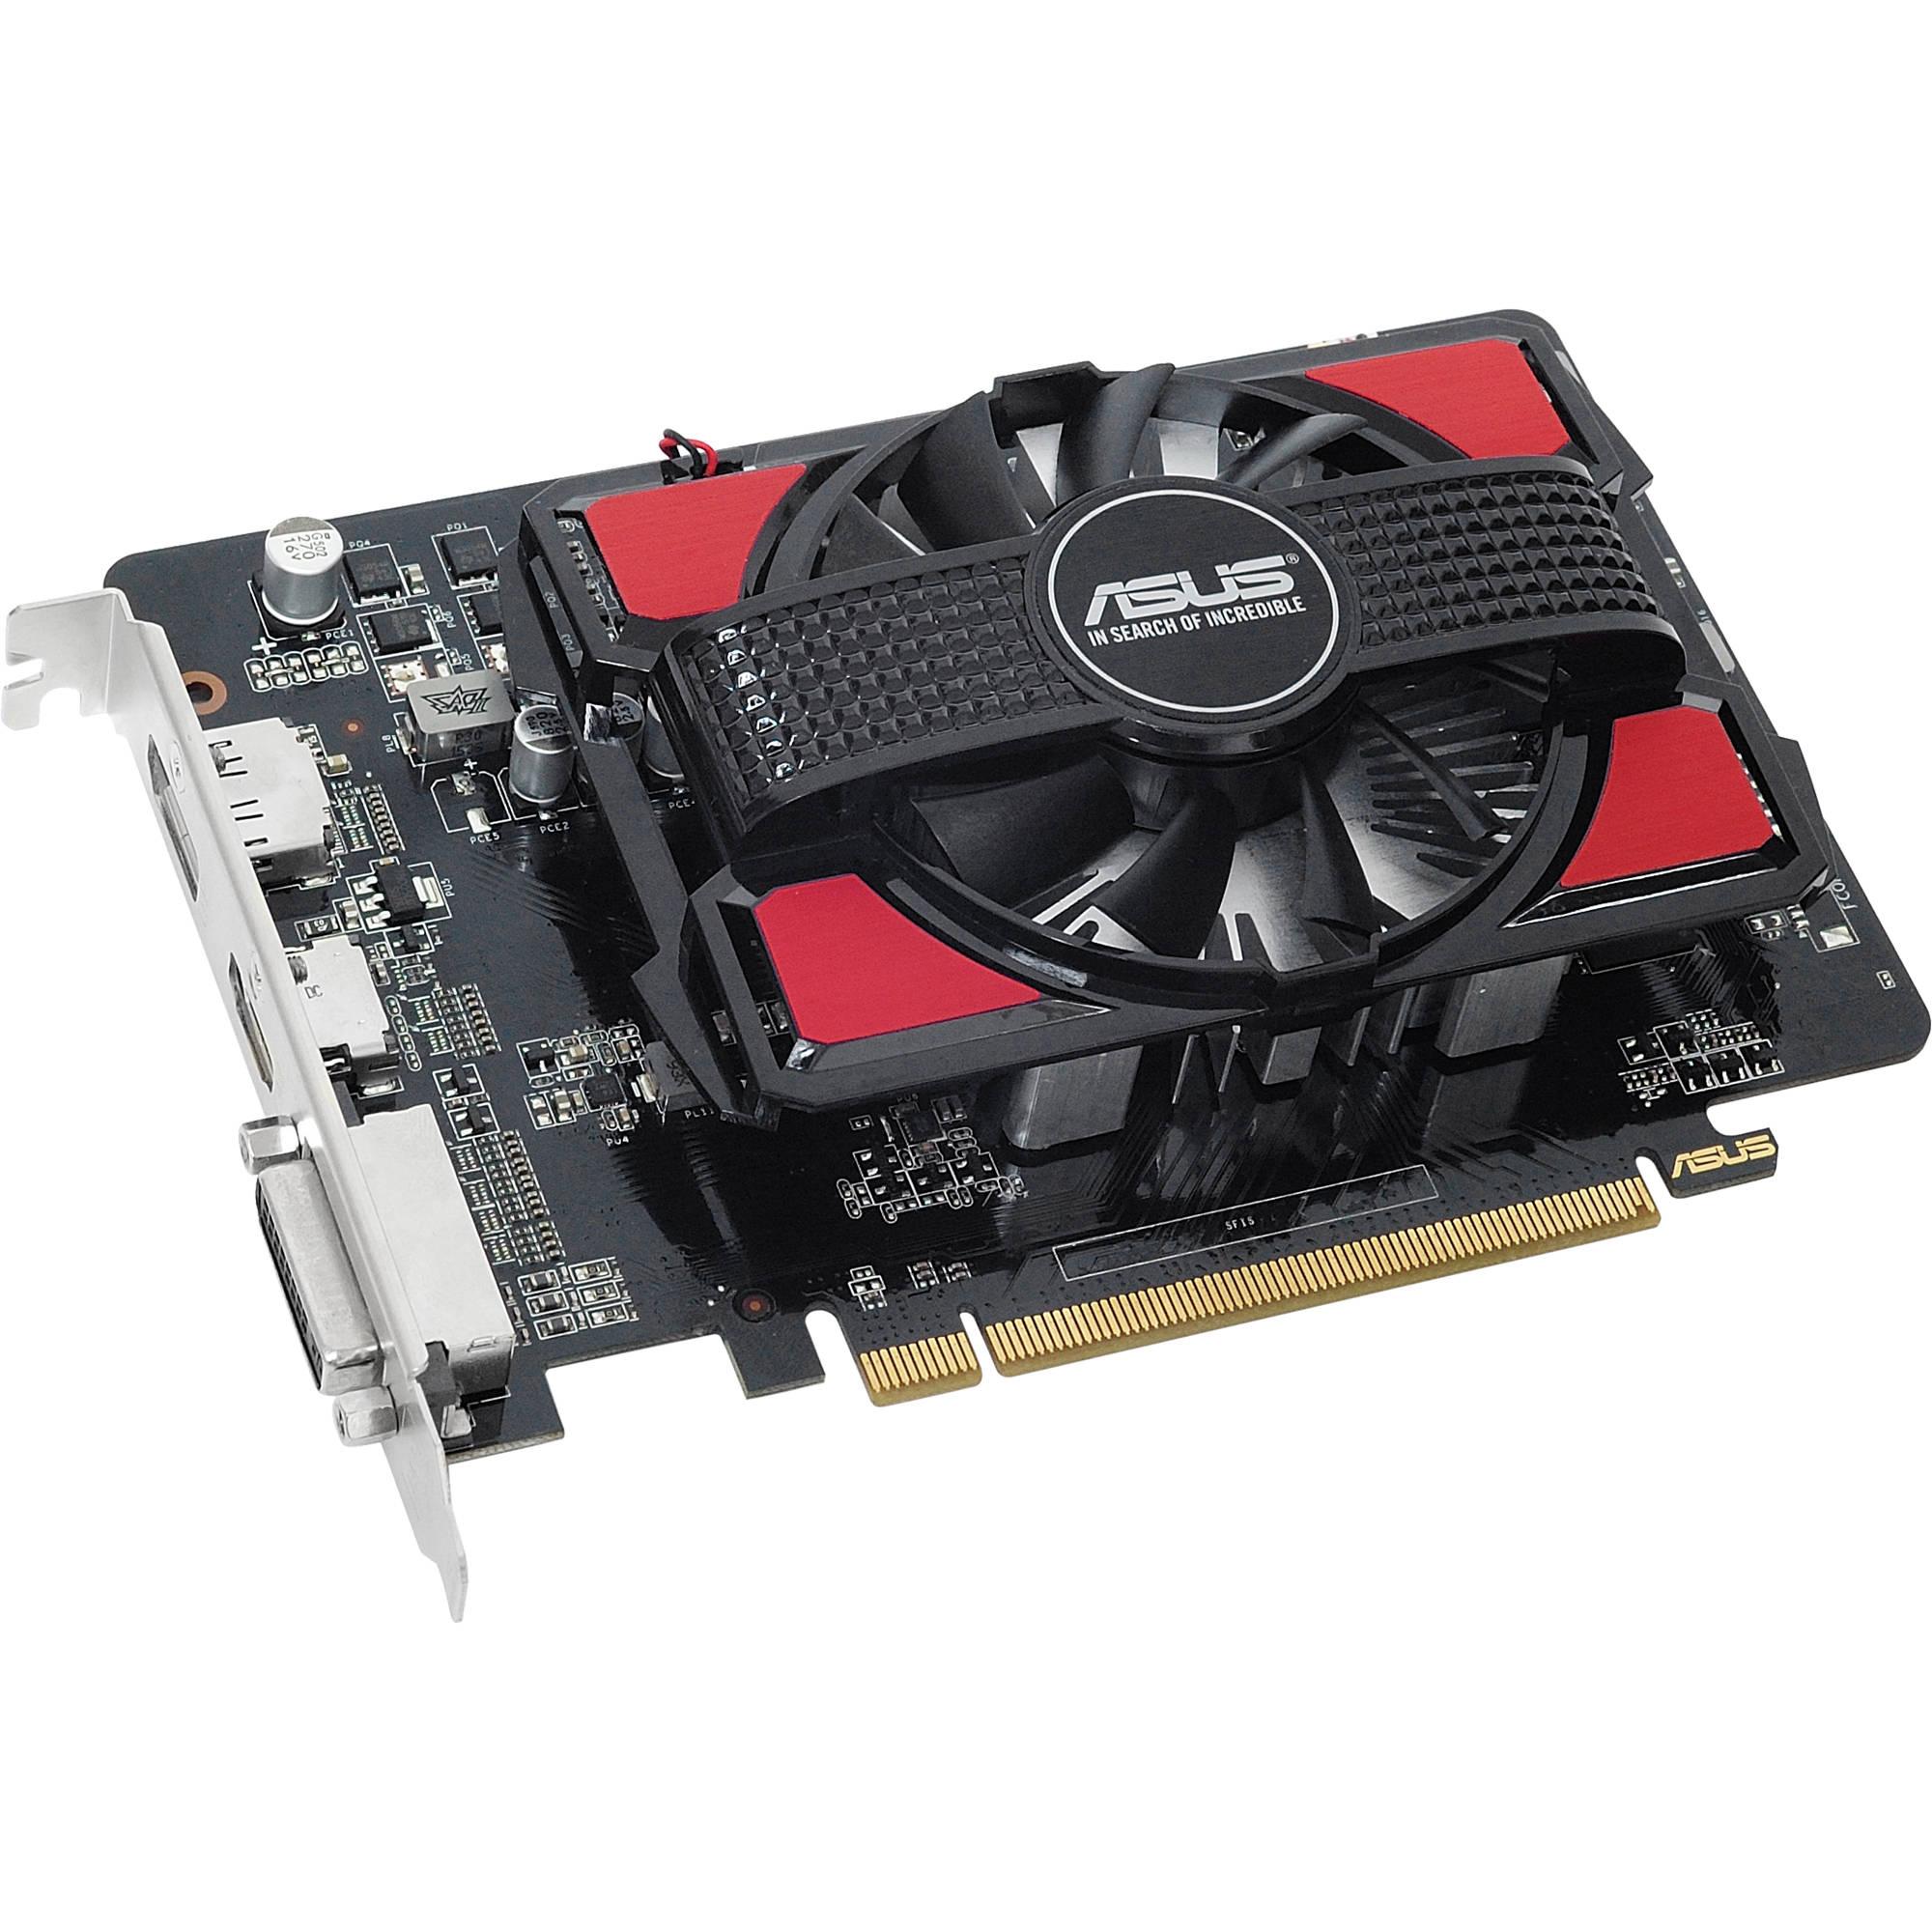 ASUS Radeon R7 250 Graphics Card